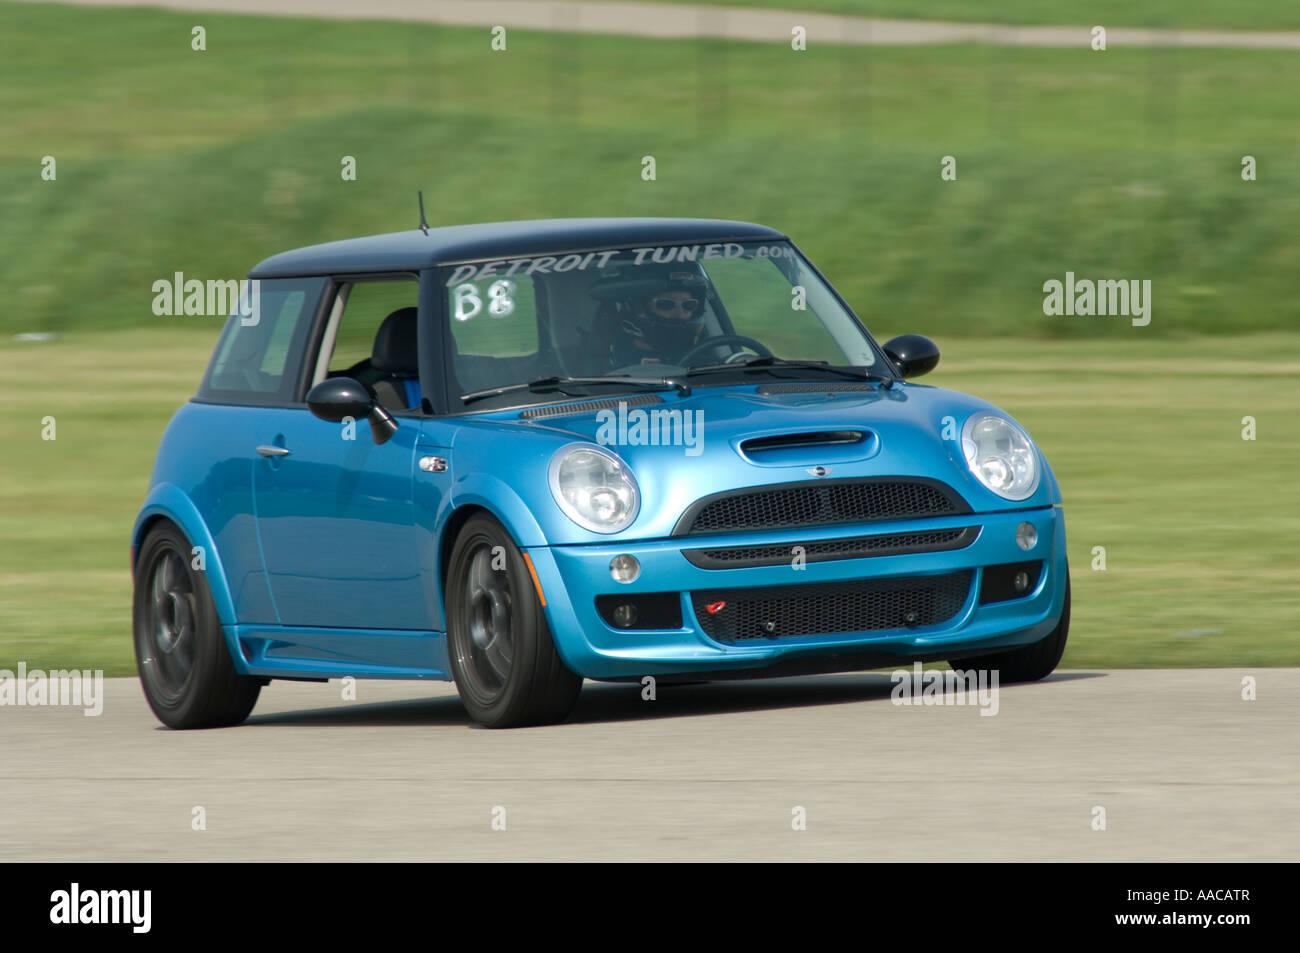 Mini Cooper S At A Track Day Event Stock Photo 12585286 Alamy